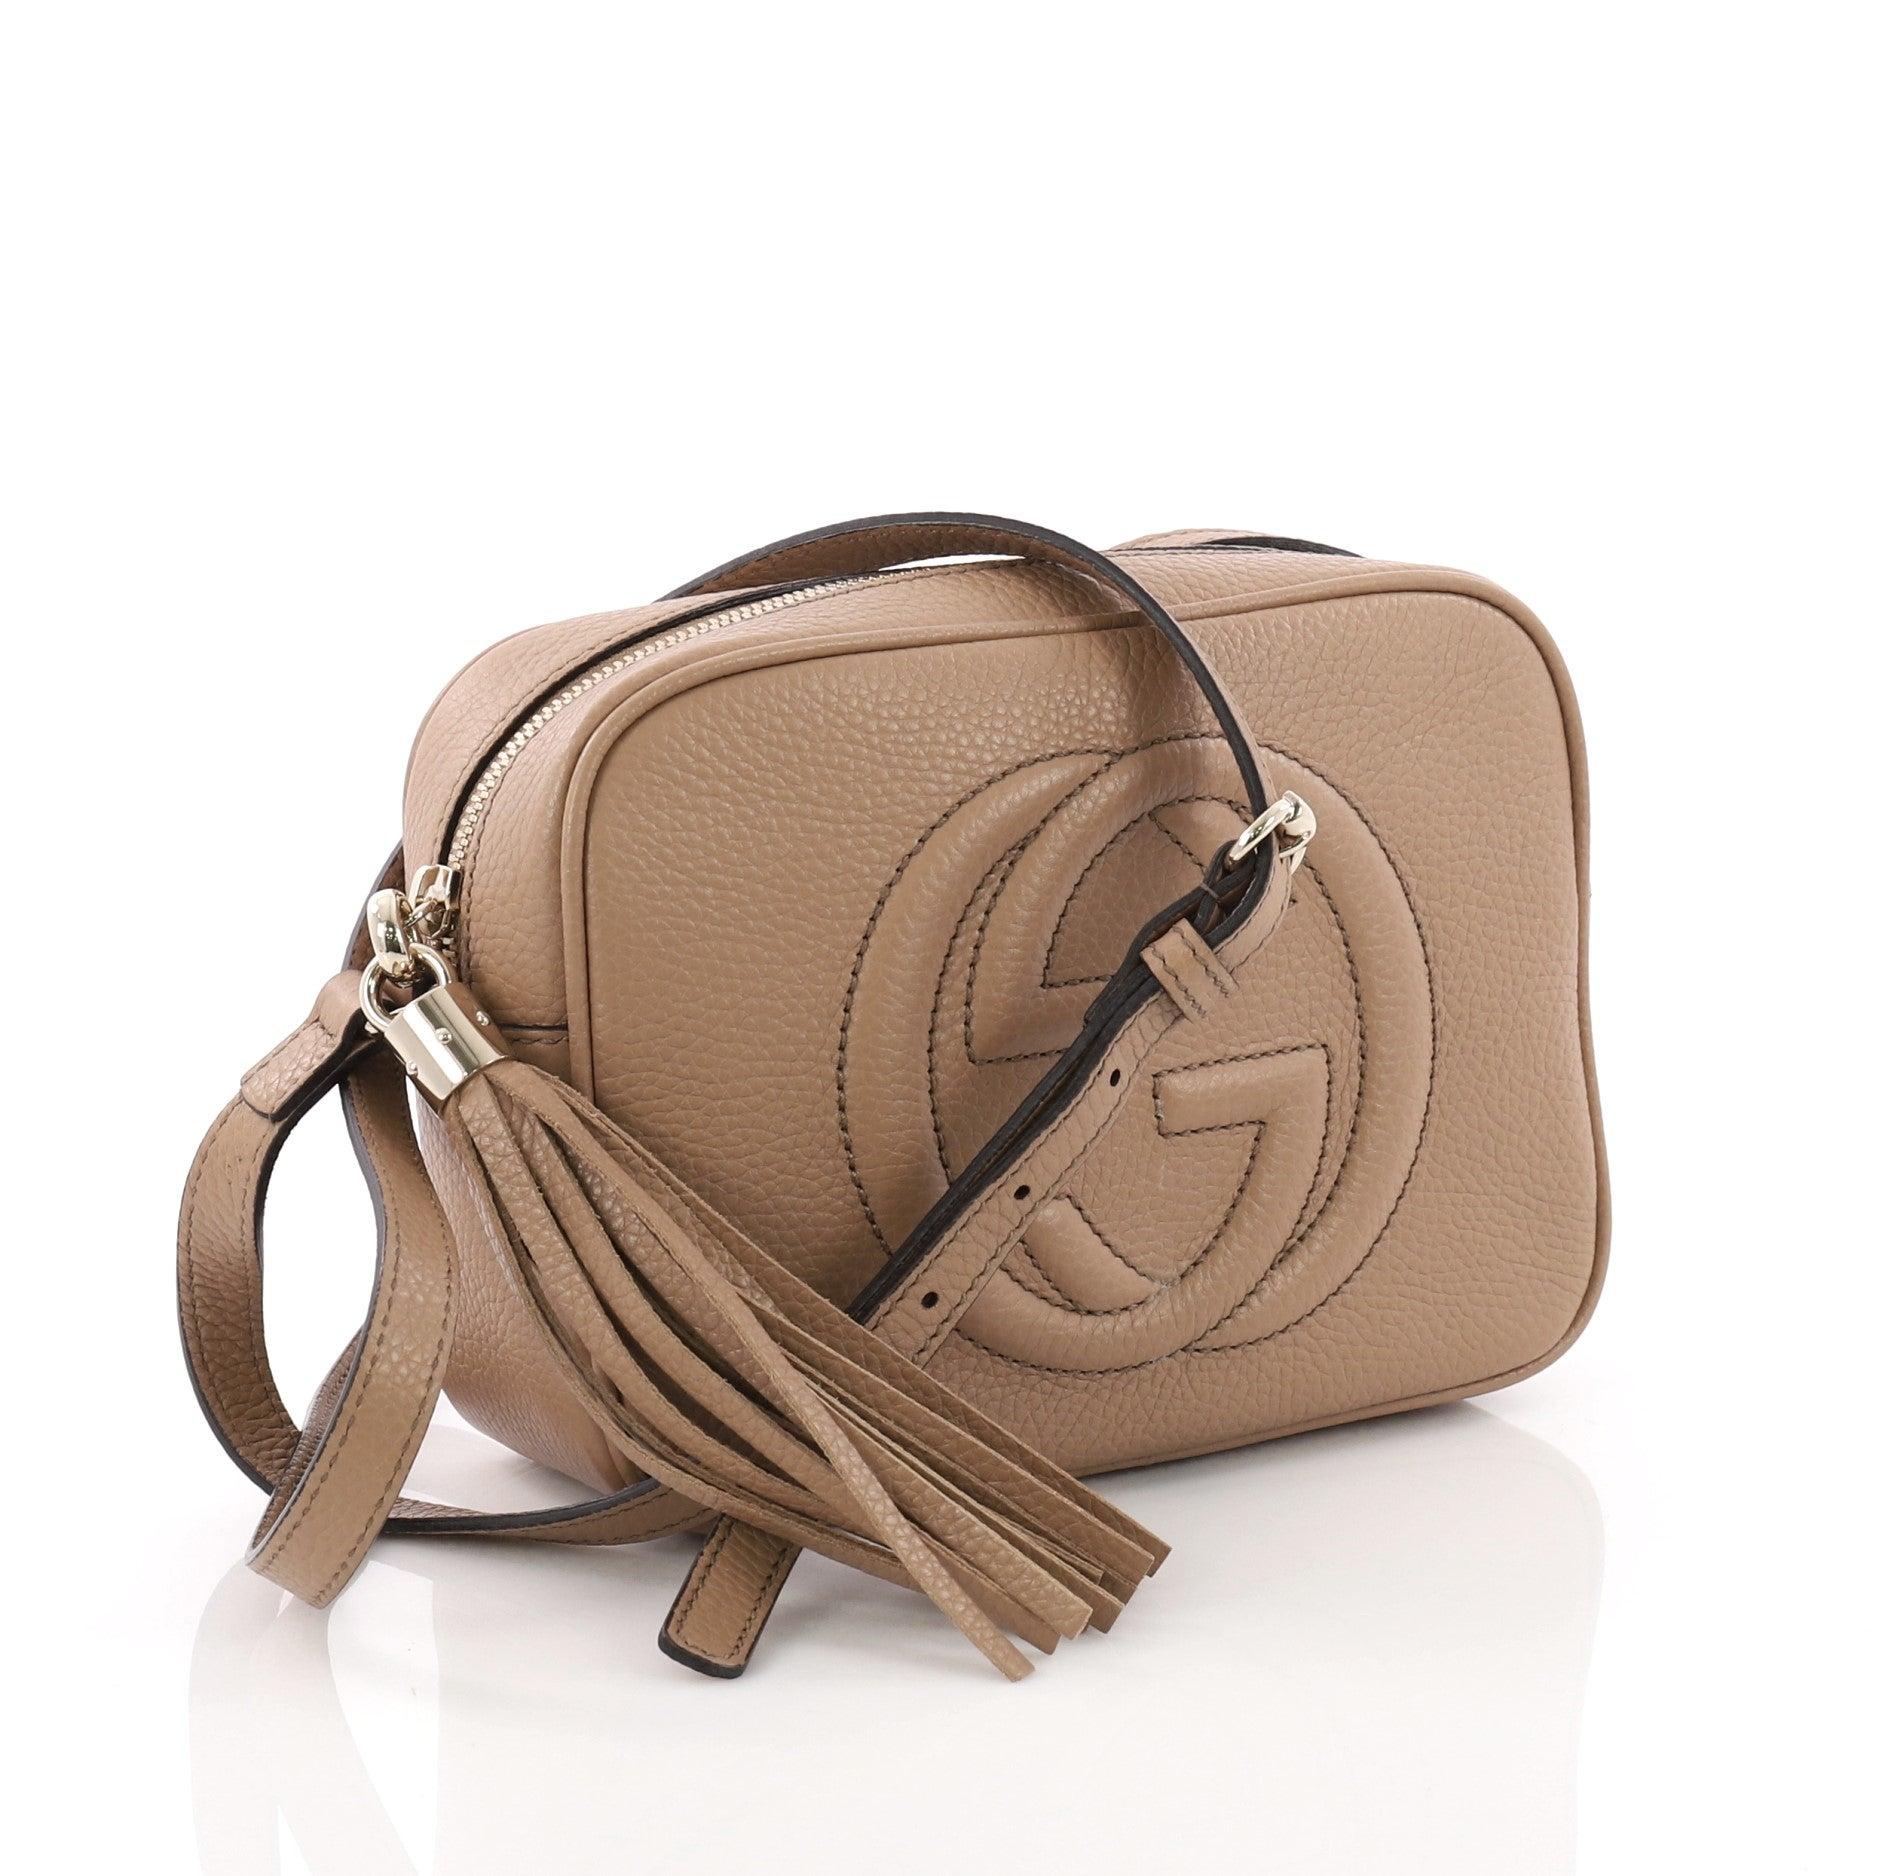 5fabca82918 Gucci Soho Disco Crossbody Bag Leather Small at 1stdibs